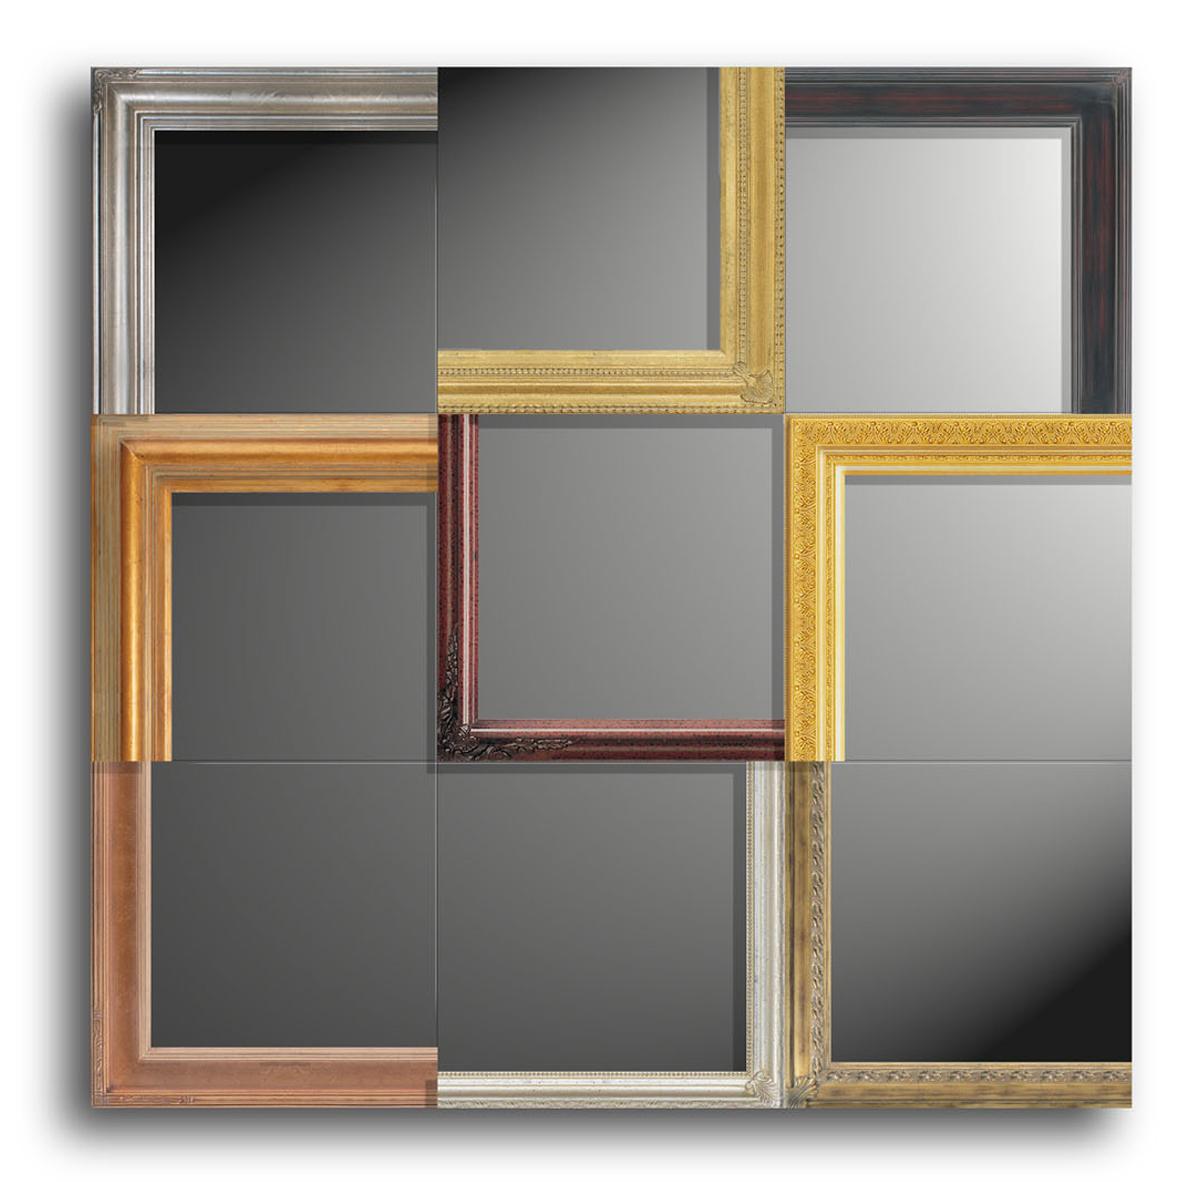 Mirror composition design